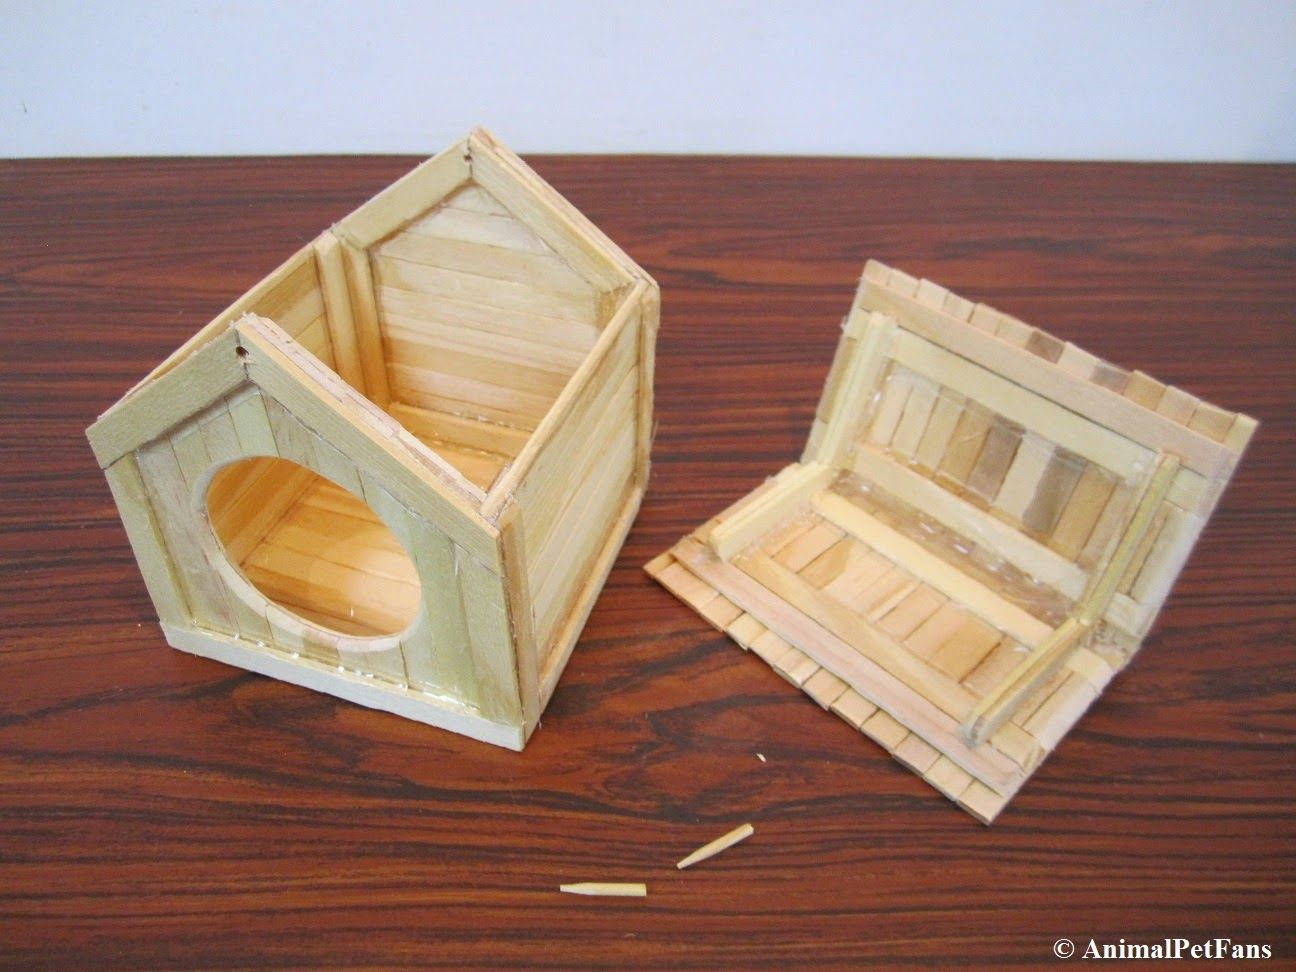 House design using popsicle sticks - Popsicle Stick Hamster House By Animalpetfans